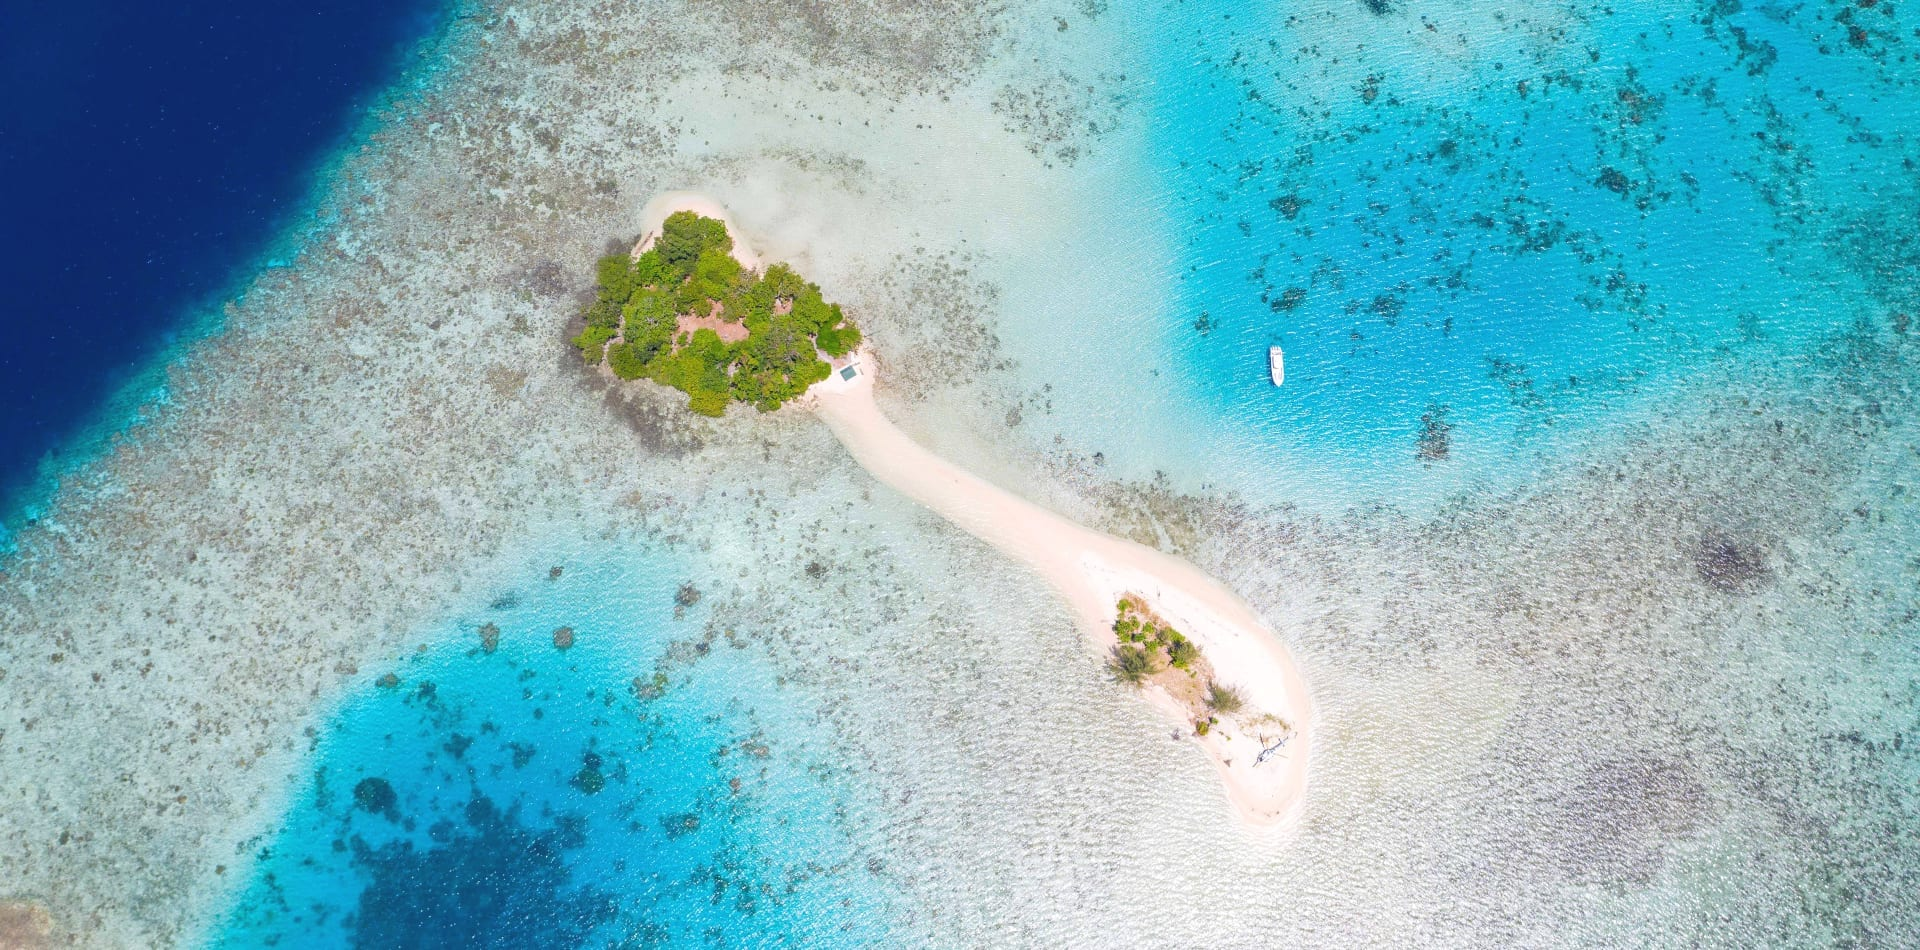 pelorus solomon islands tender island beach